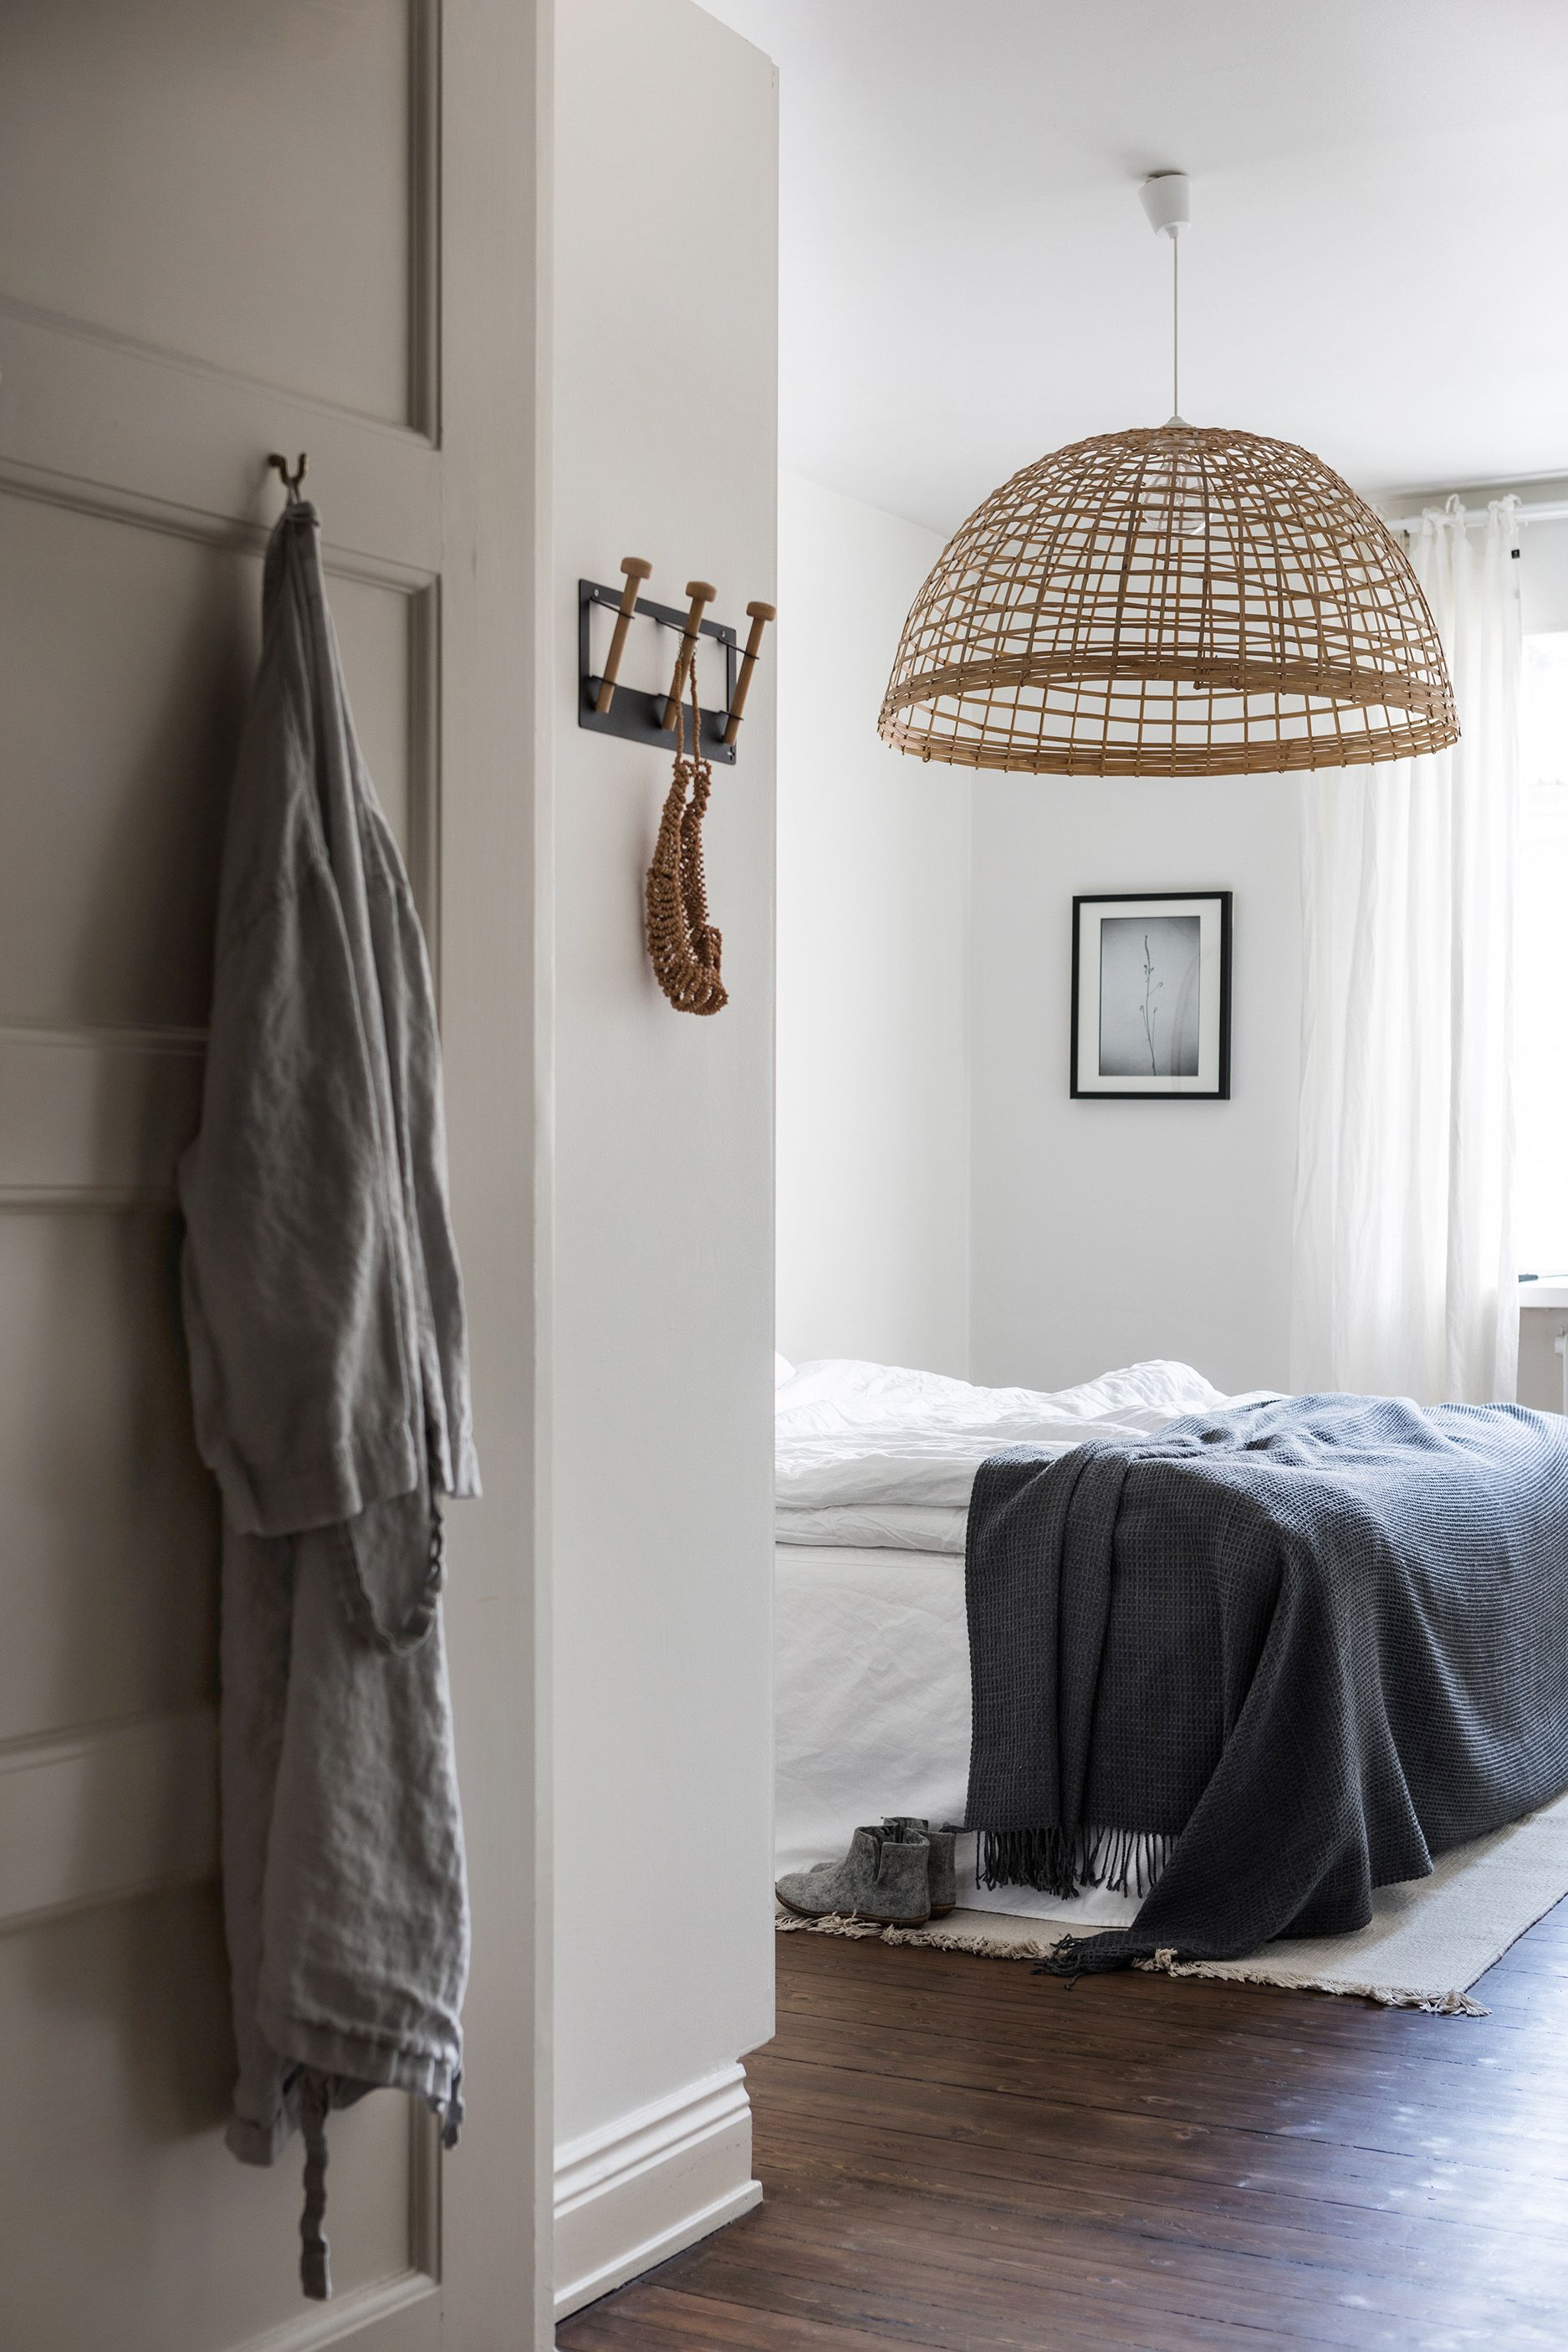 11 Unique Bedroom Lighting Ideas - Lighting Ideas